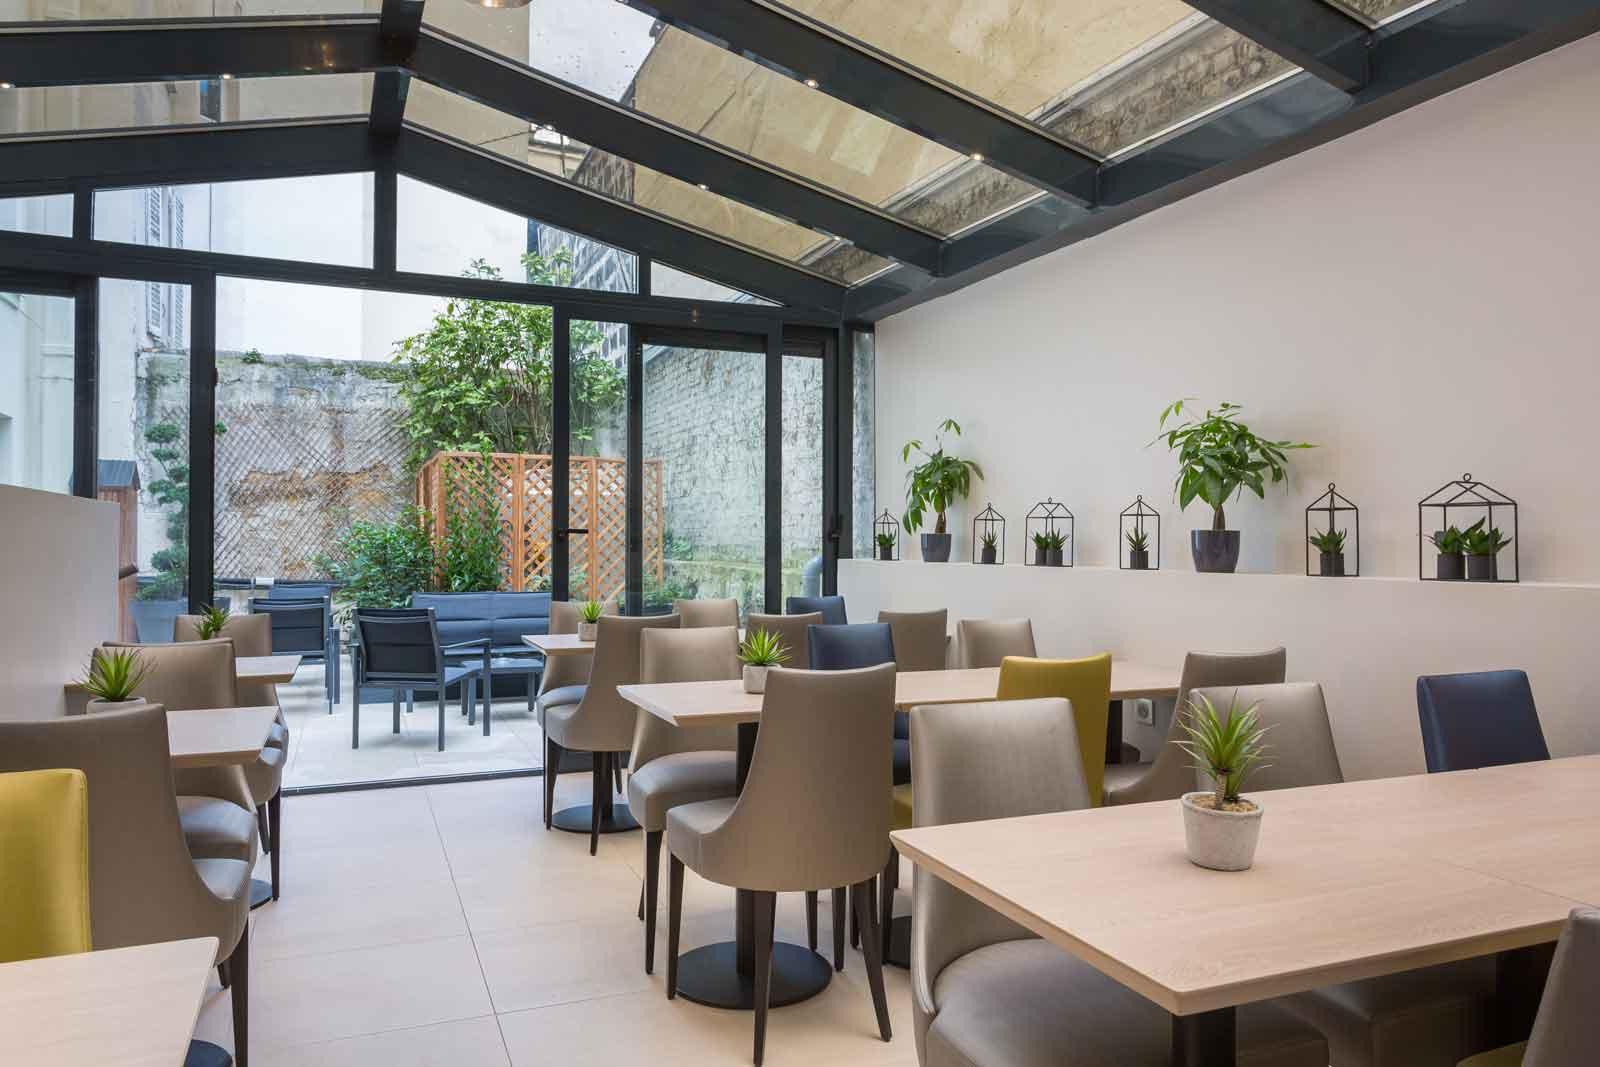 petit d jeuner buffet gourmand h tel jardin de villiers. Black Bedroom Furniture Sets. Home Design Ideas